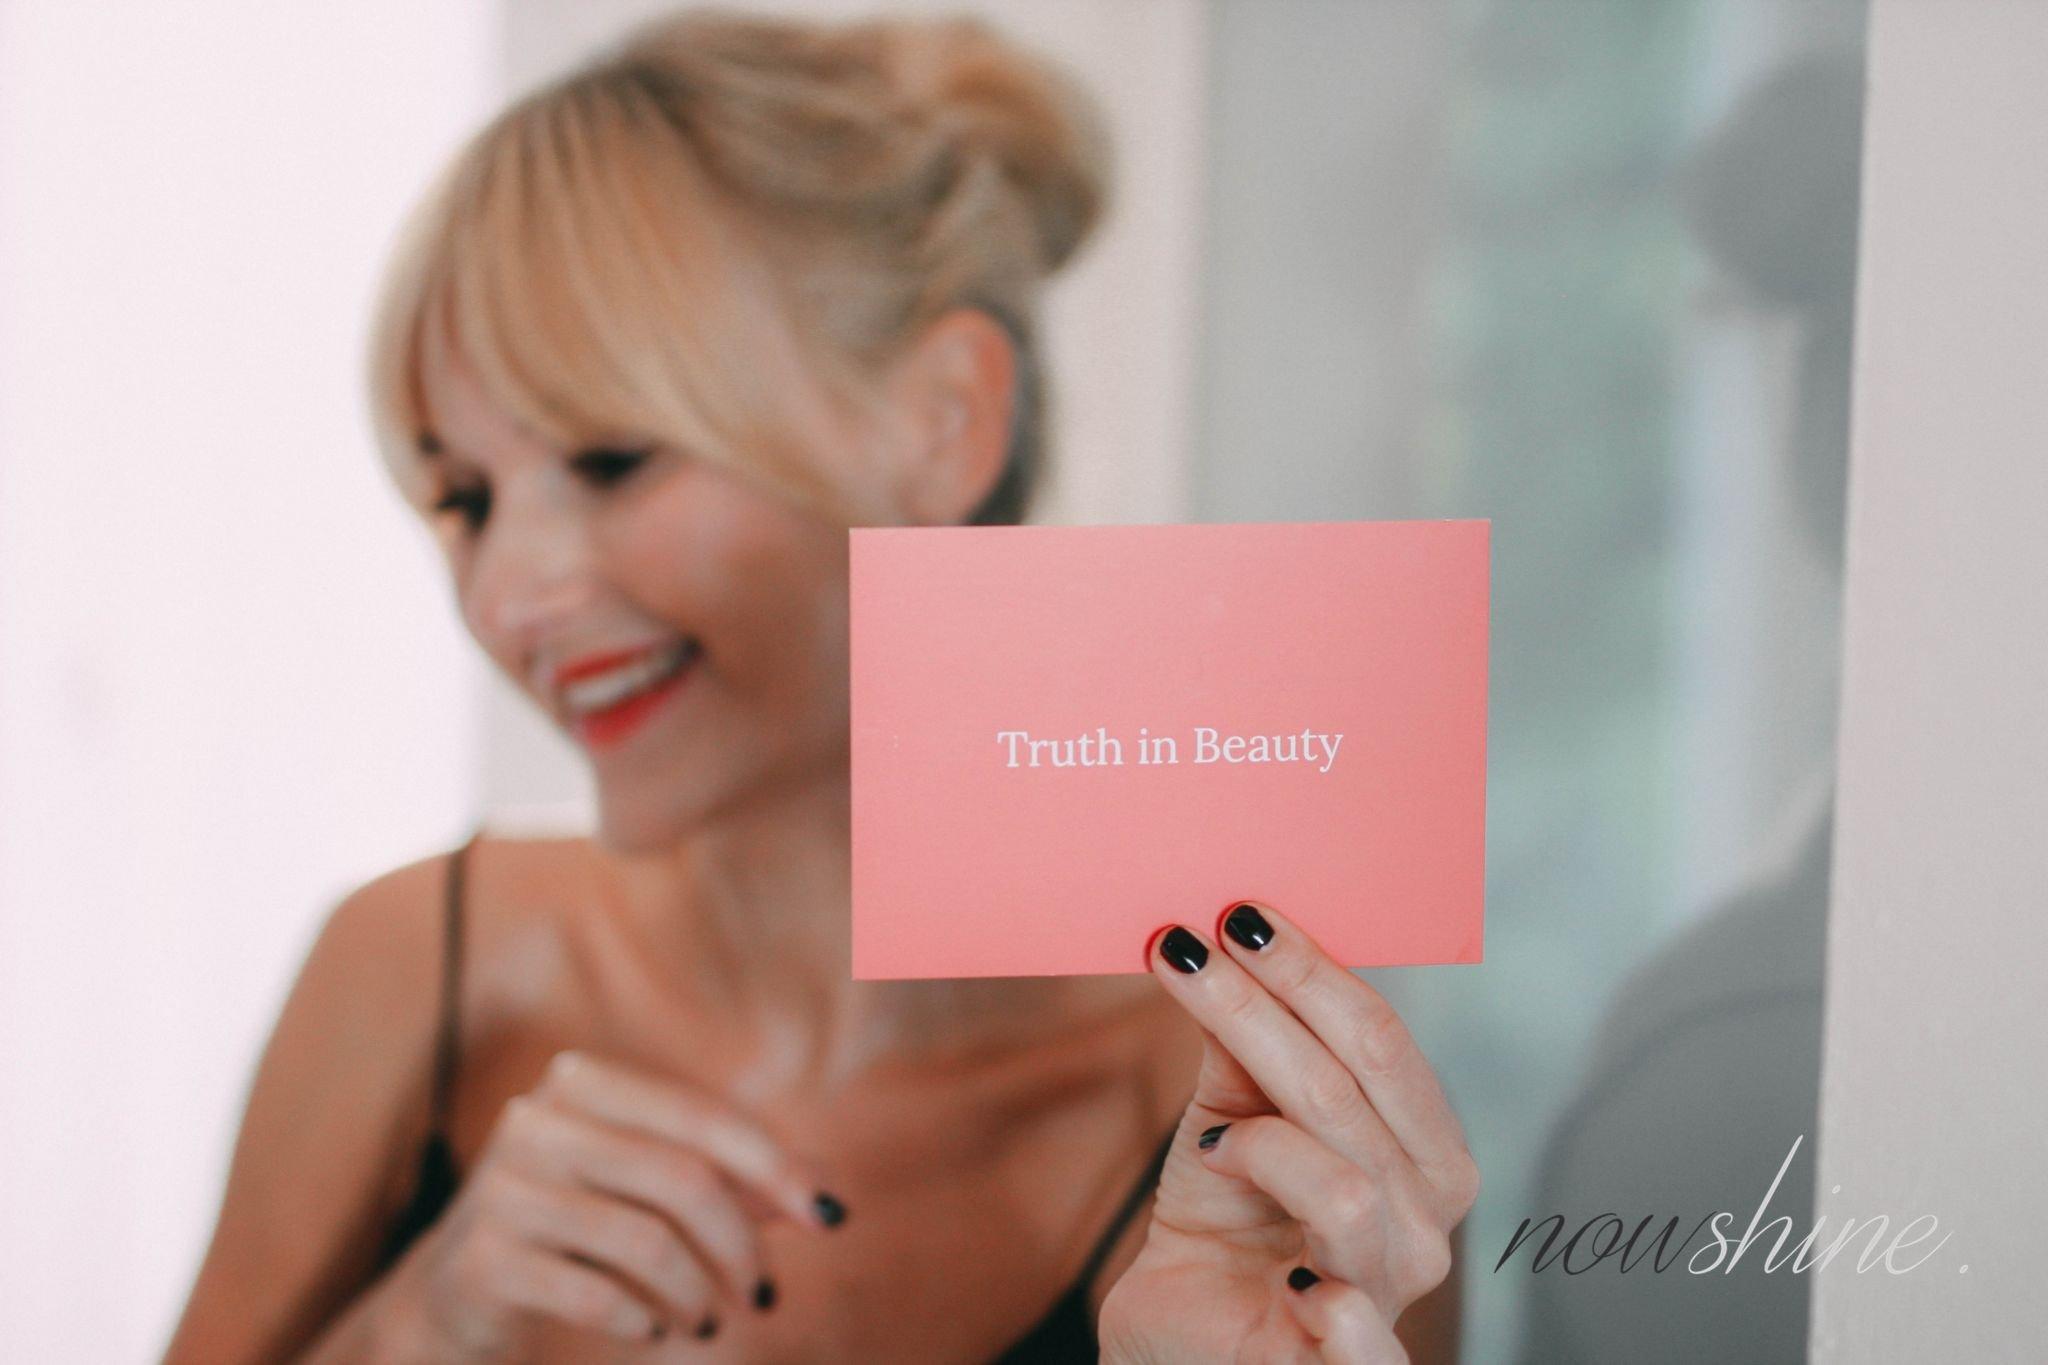 Defense Line von Paula´s Choice - Doro von Nowshine - Beauty ü40 - my life, my city, my skin Kampagne - Truth in Beauty